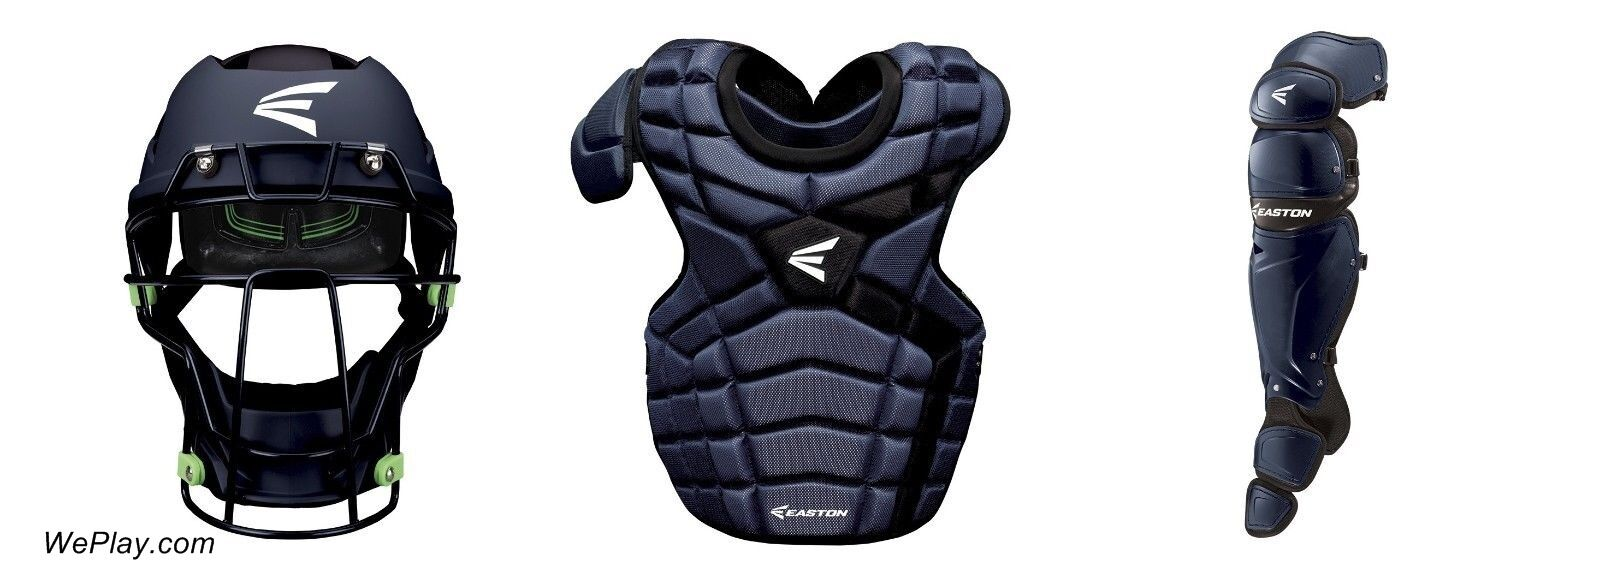 Easton Mako II béisbol atrapasueños Gear Set Paquete intermedio Kit Azul Marino Nuevo